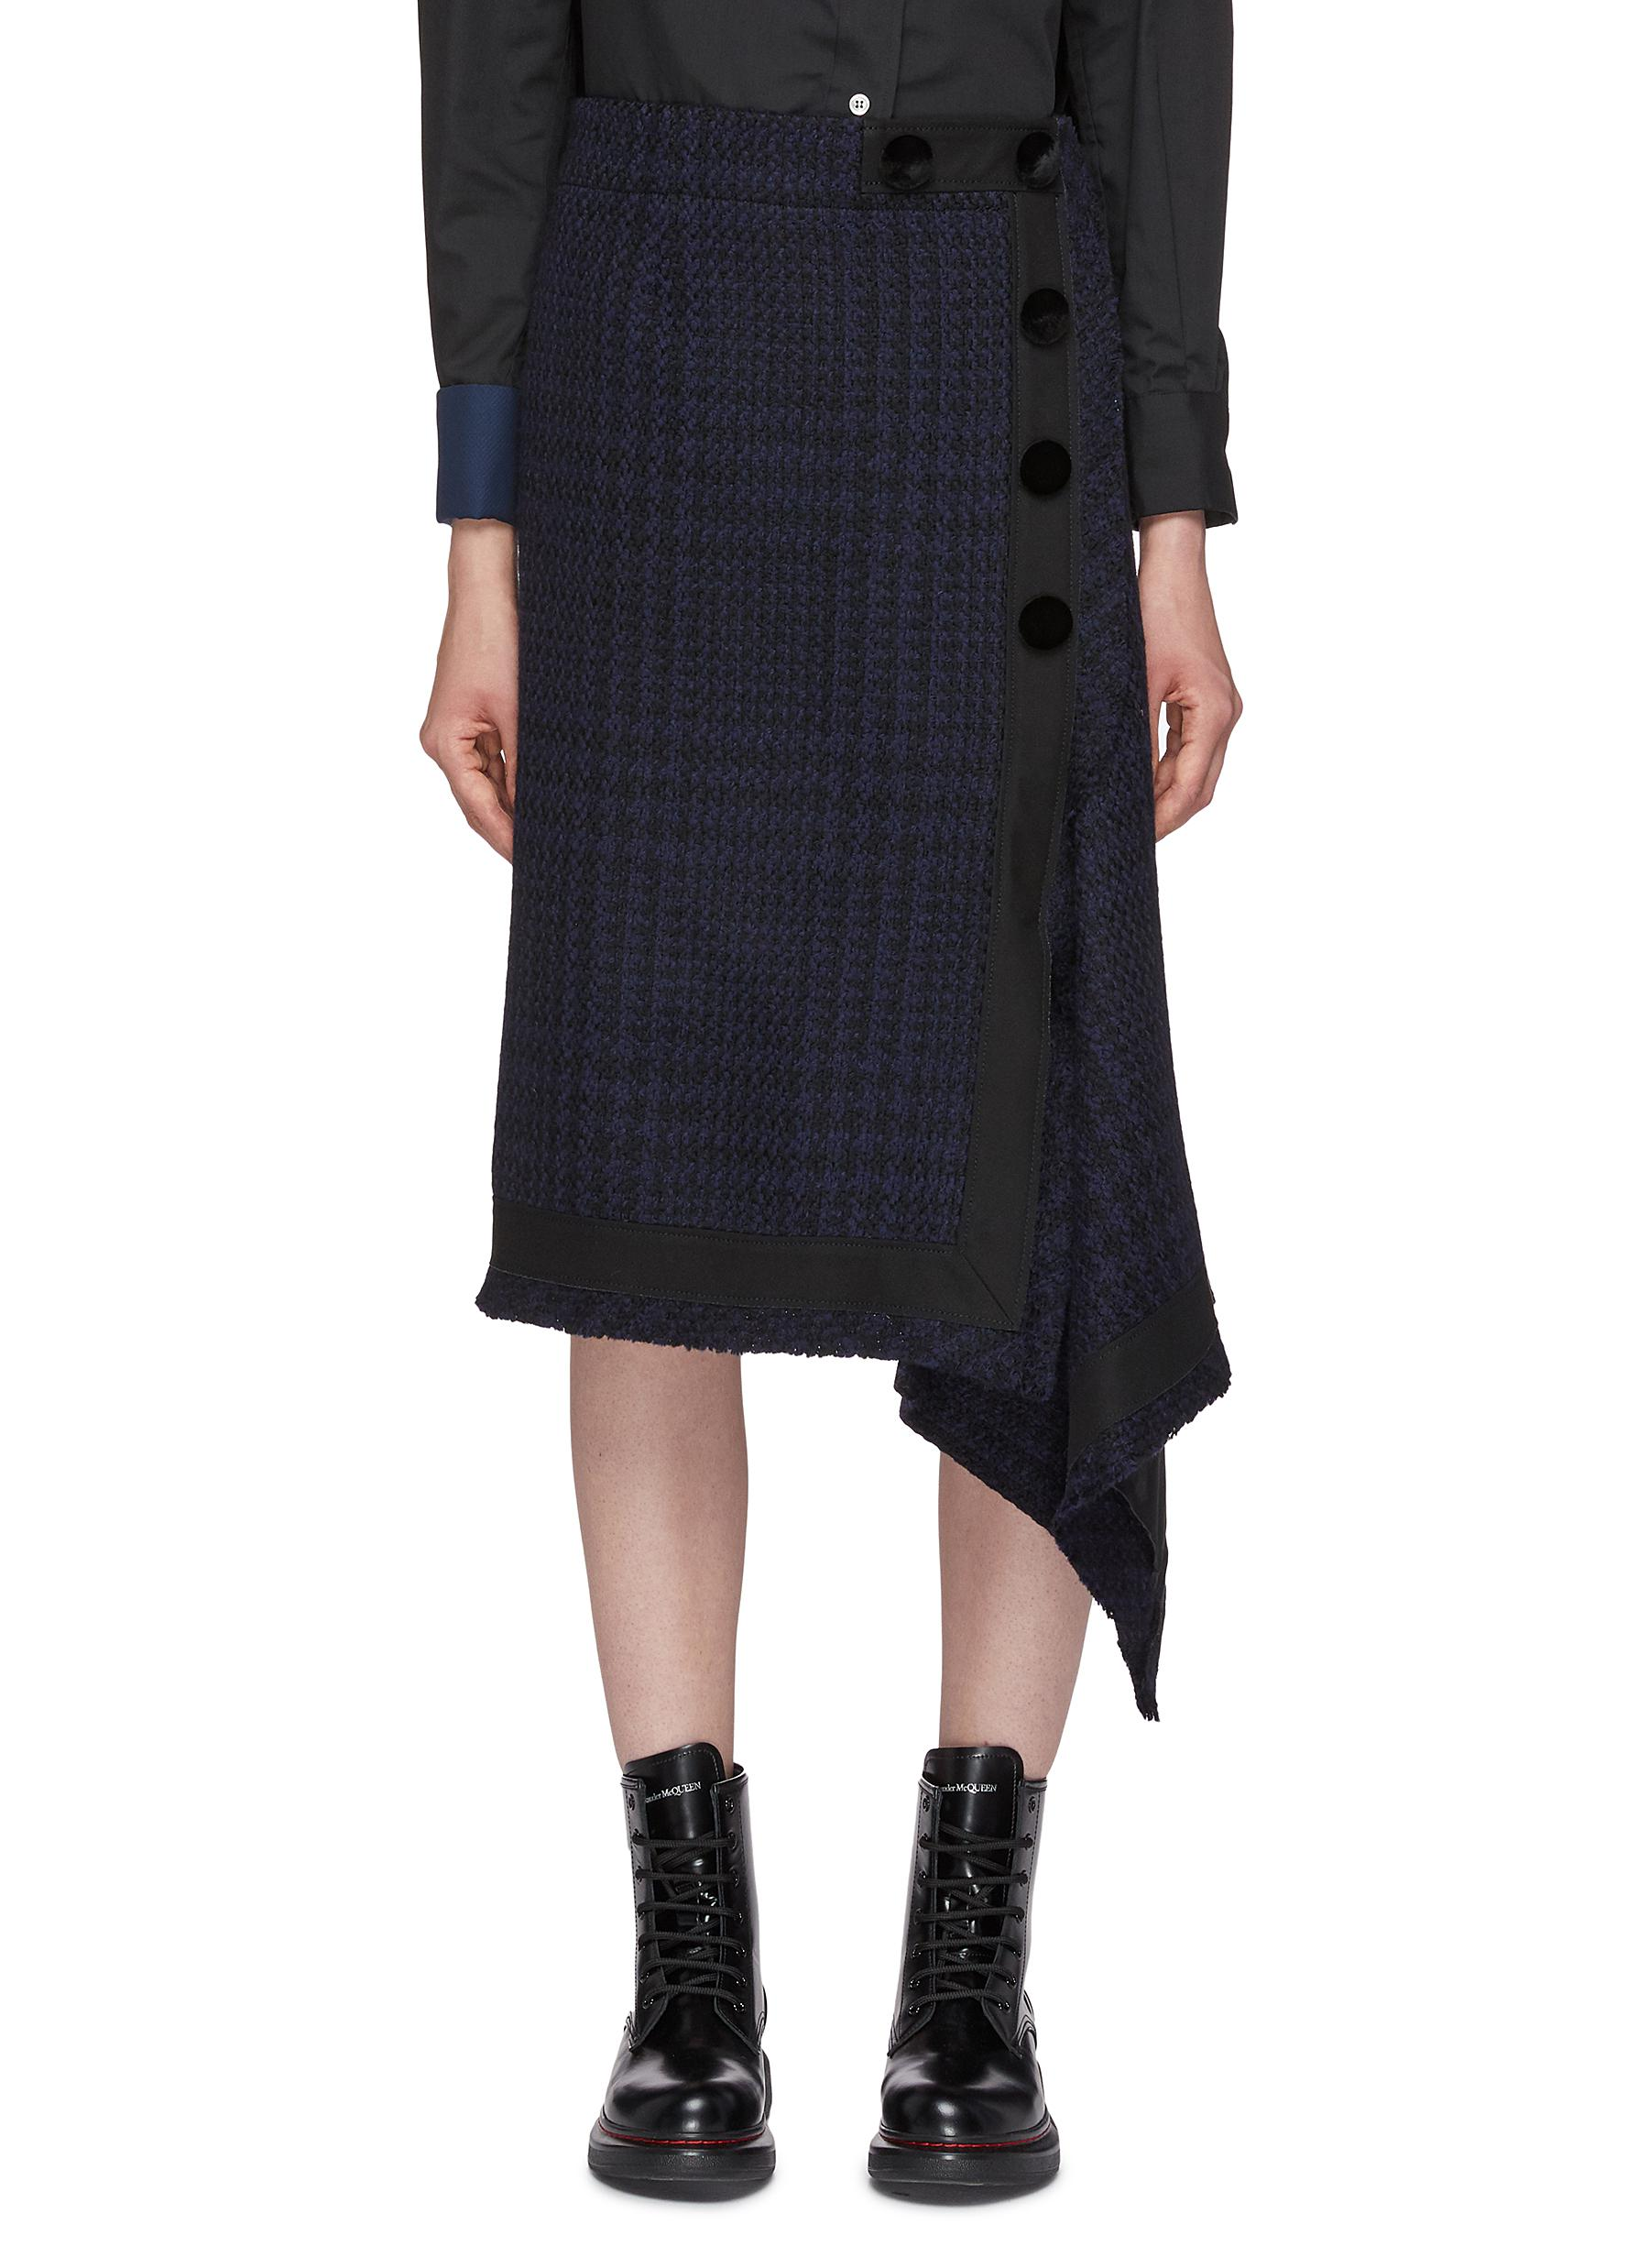 Button side asymmetric drape tartan plaid wool skirt by Sacai